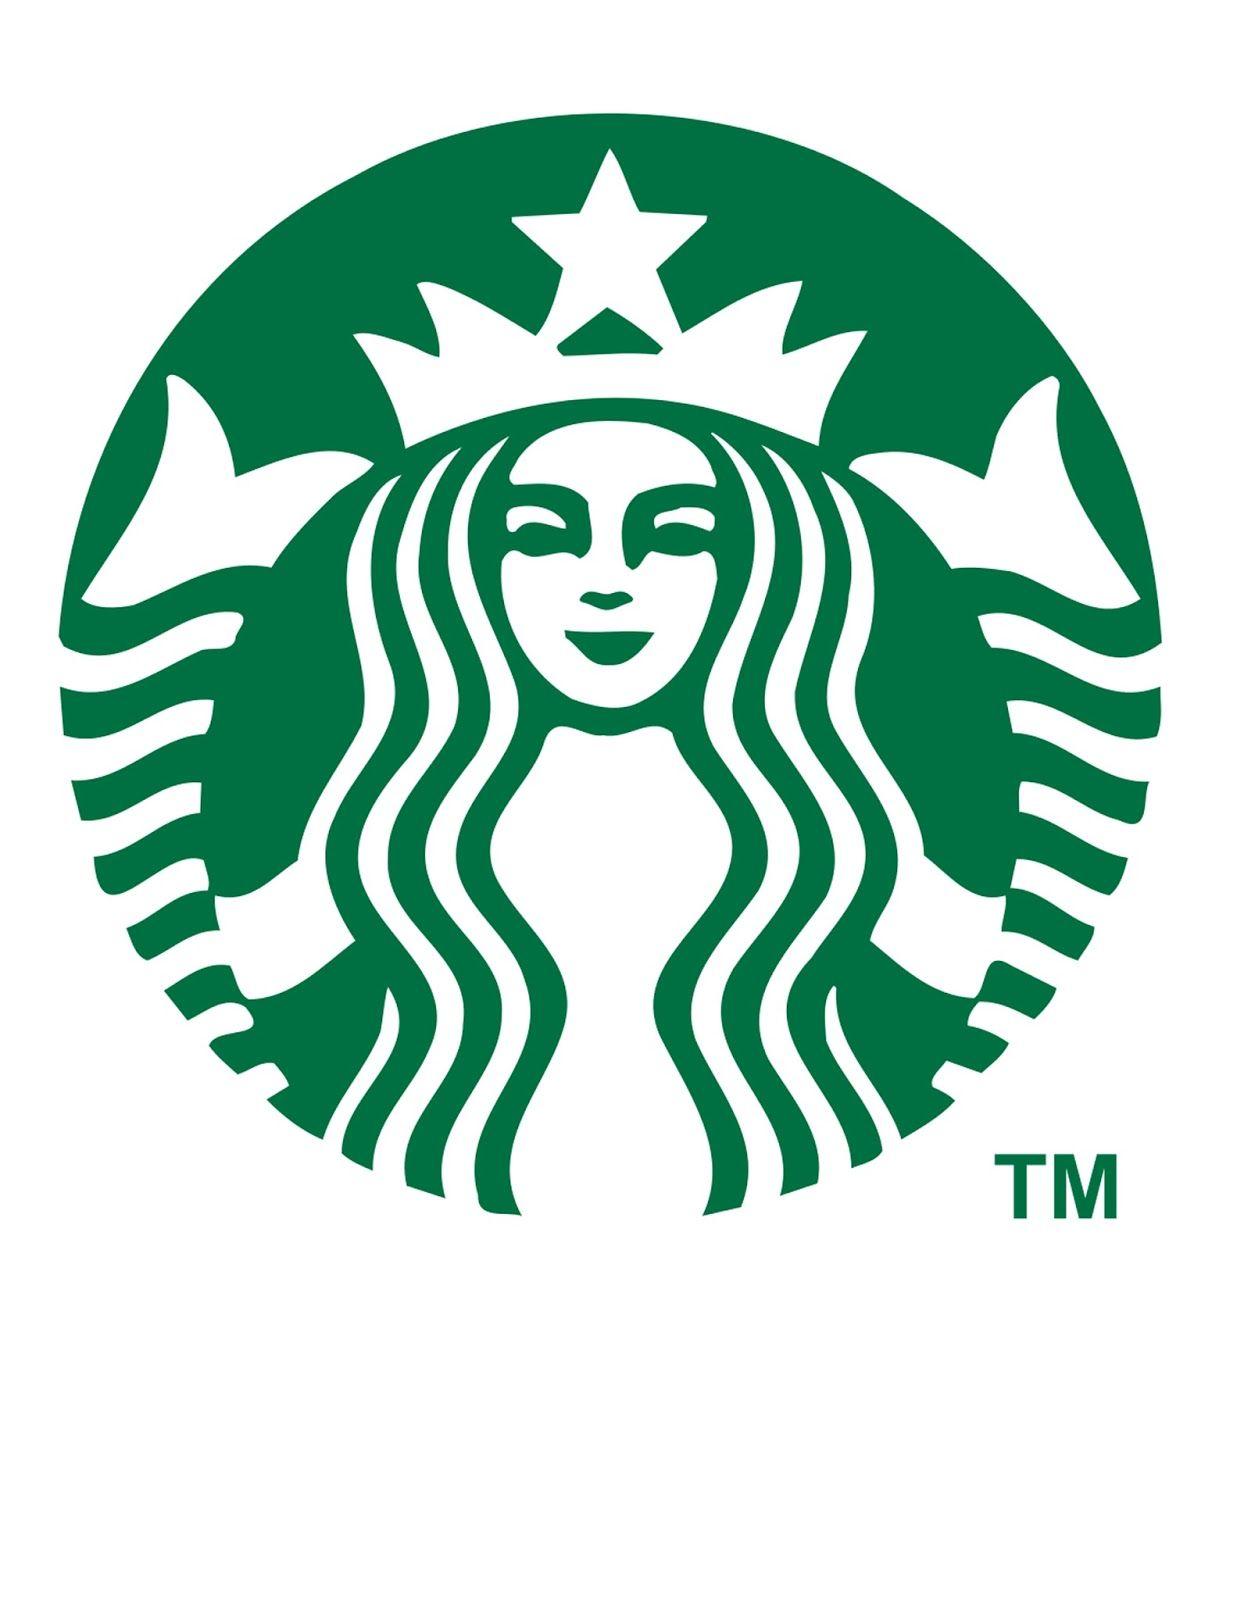 Starbucks Logo Couples Halloween Costumes In 2019 Starbucks Logo